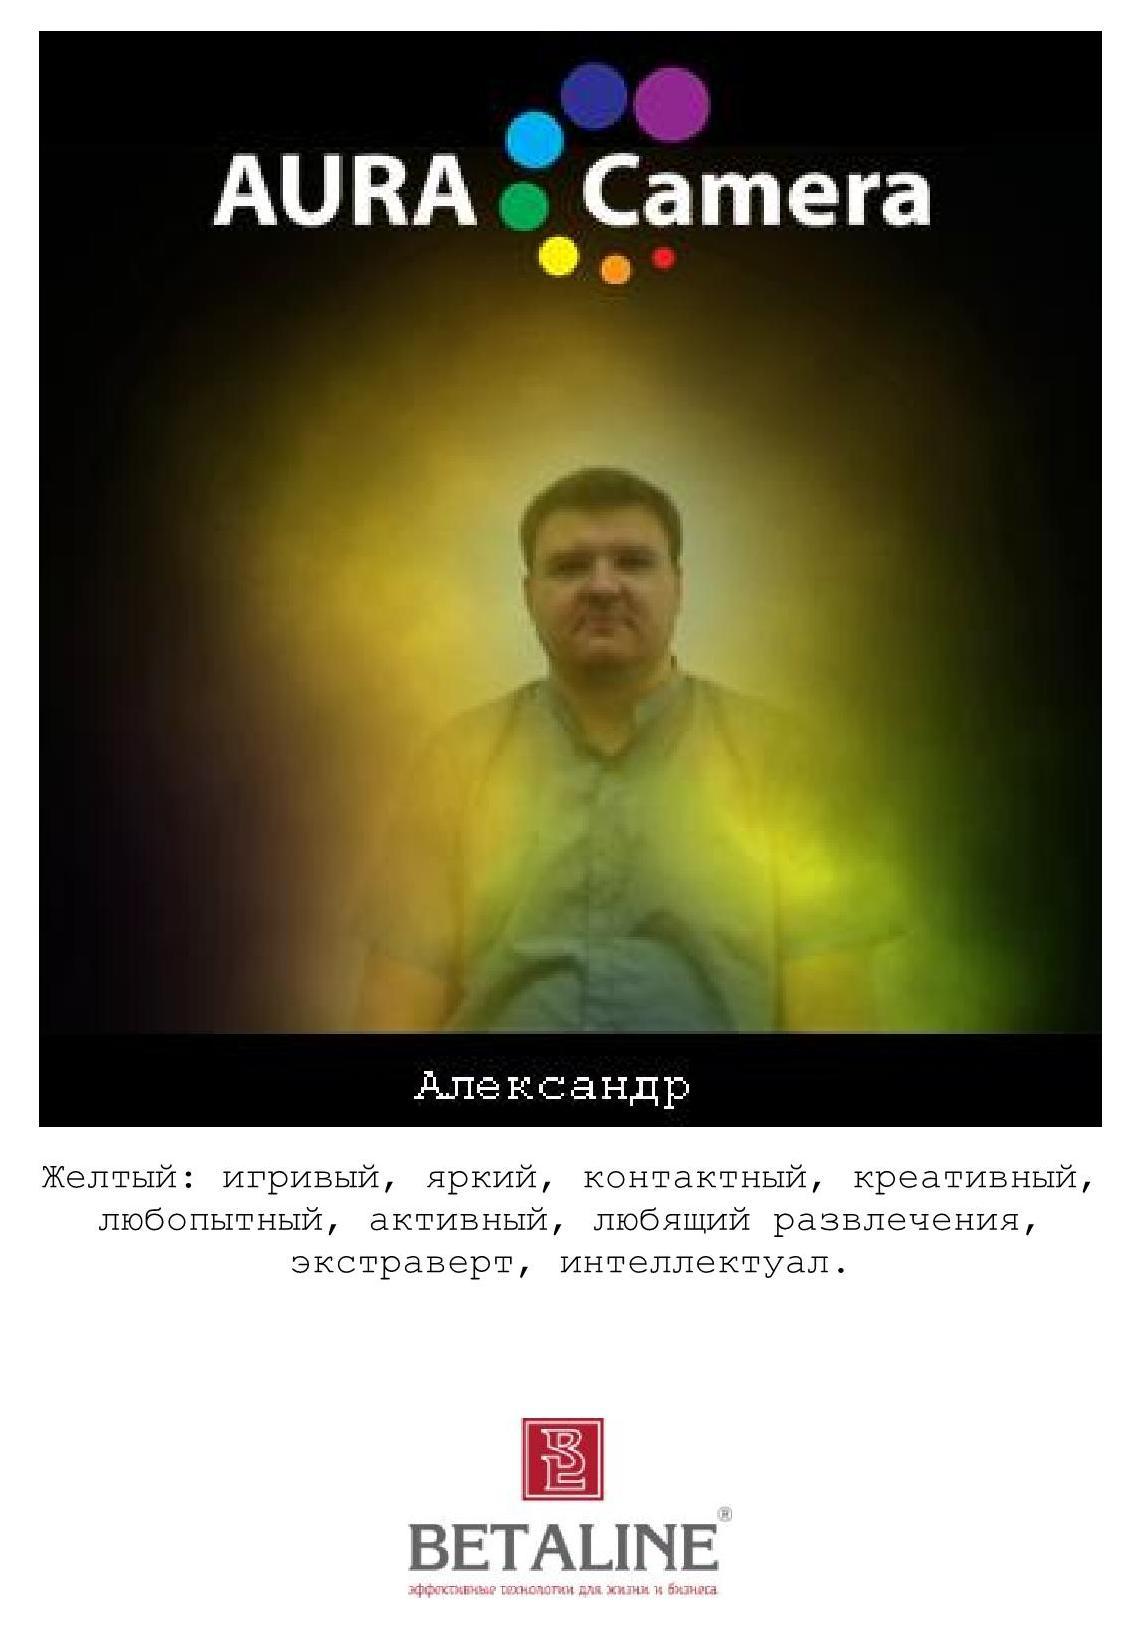 Report01N Ульянов Александр1